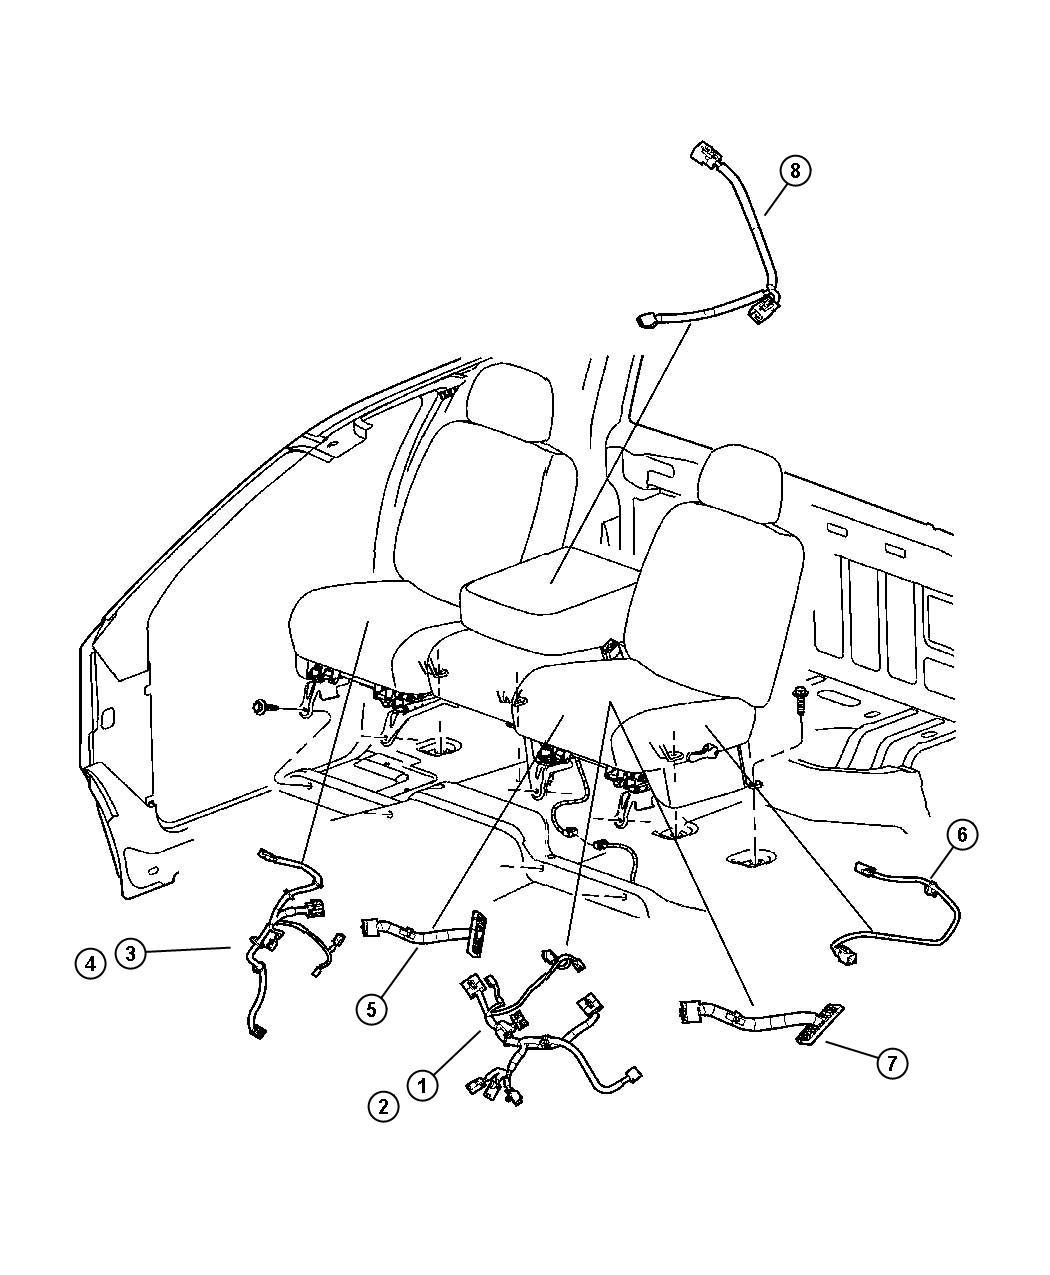 Dodge Ram 1500 Wiring  Jumper  Armrest  Trim   Seat